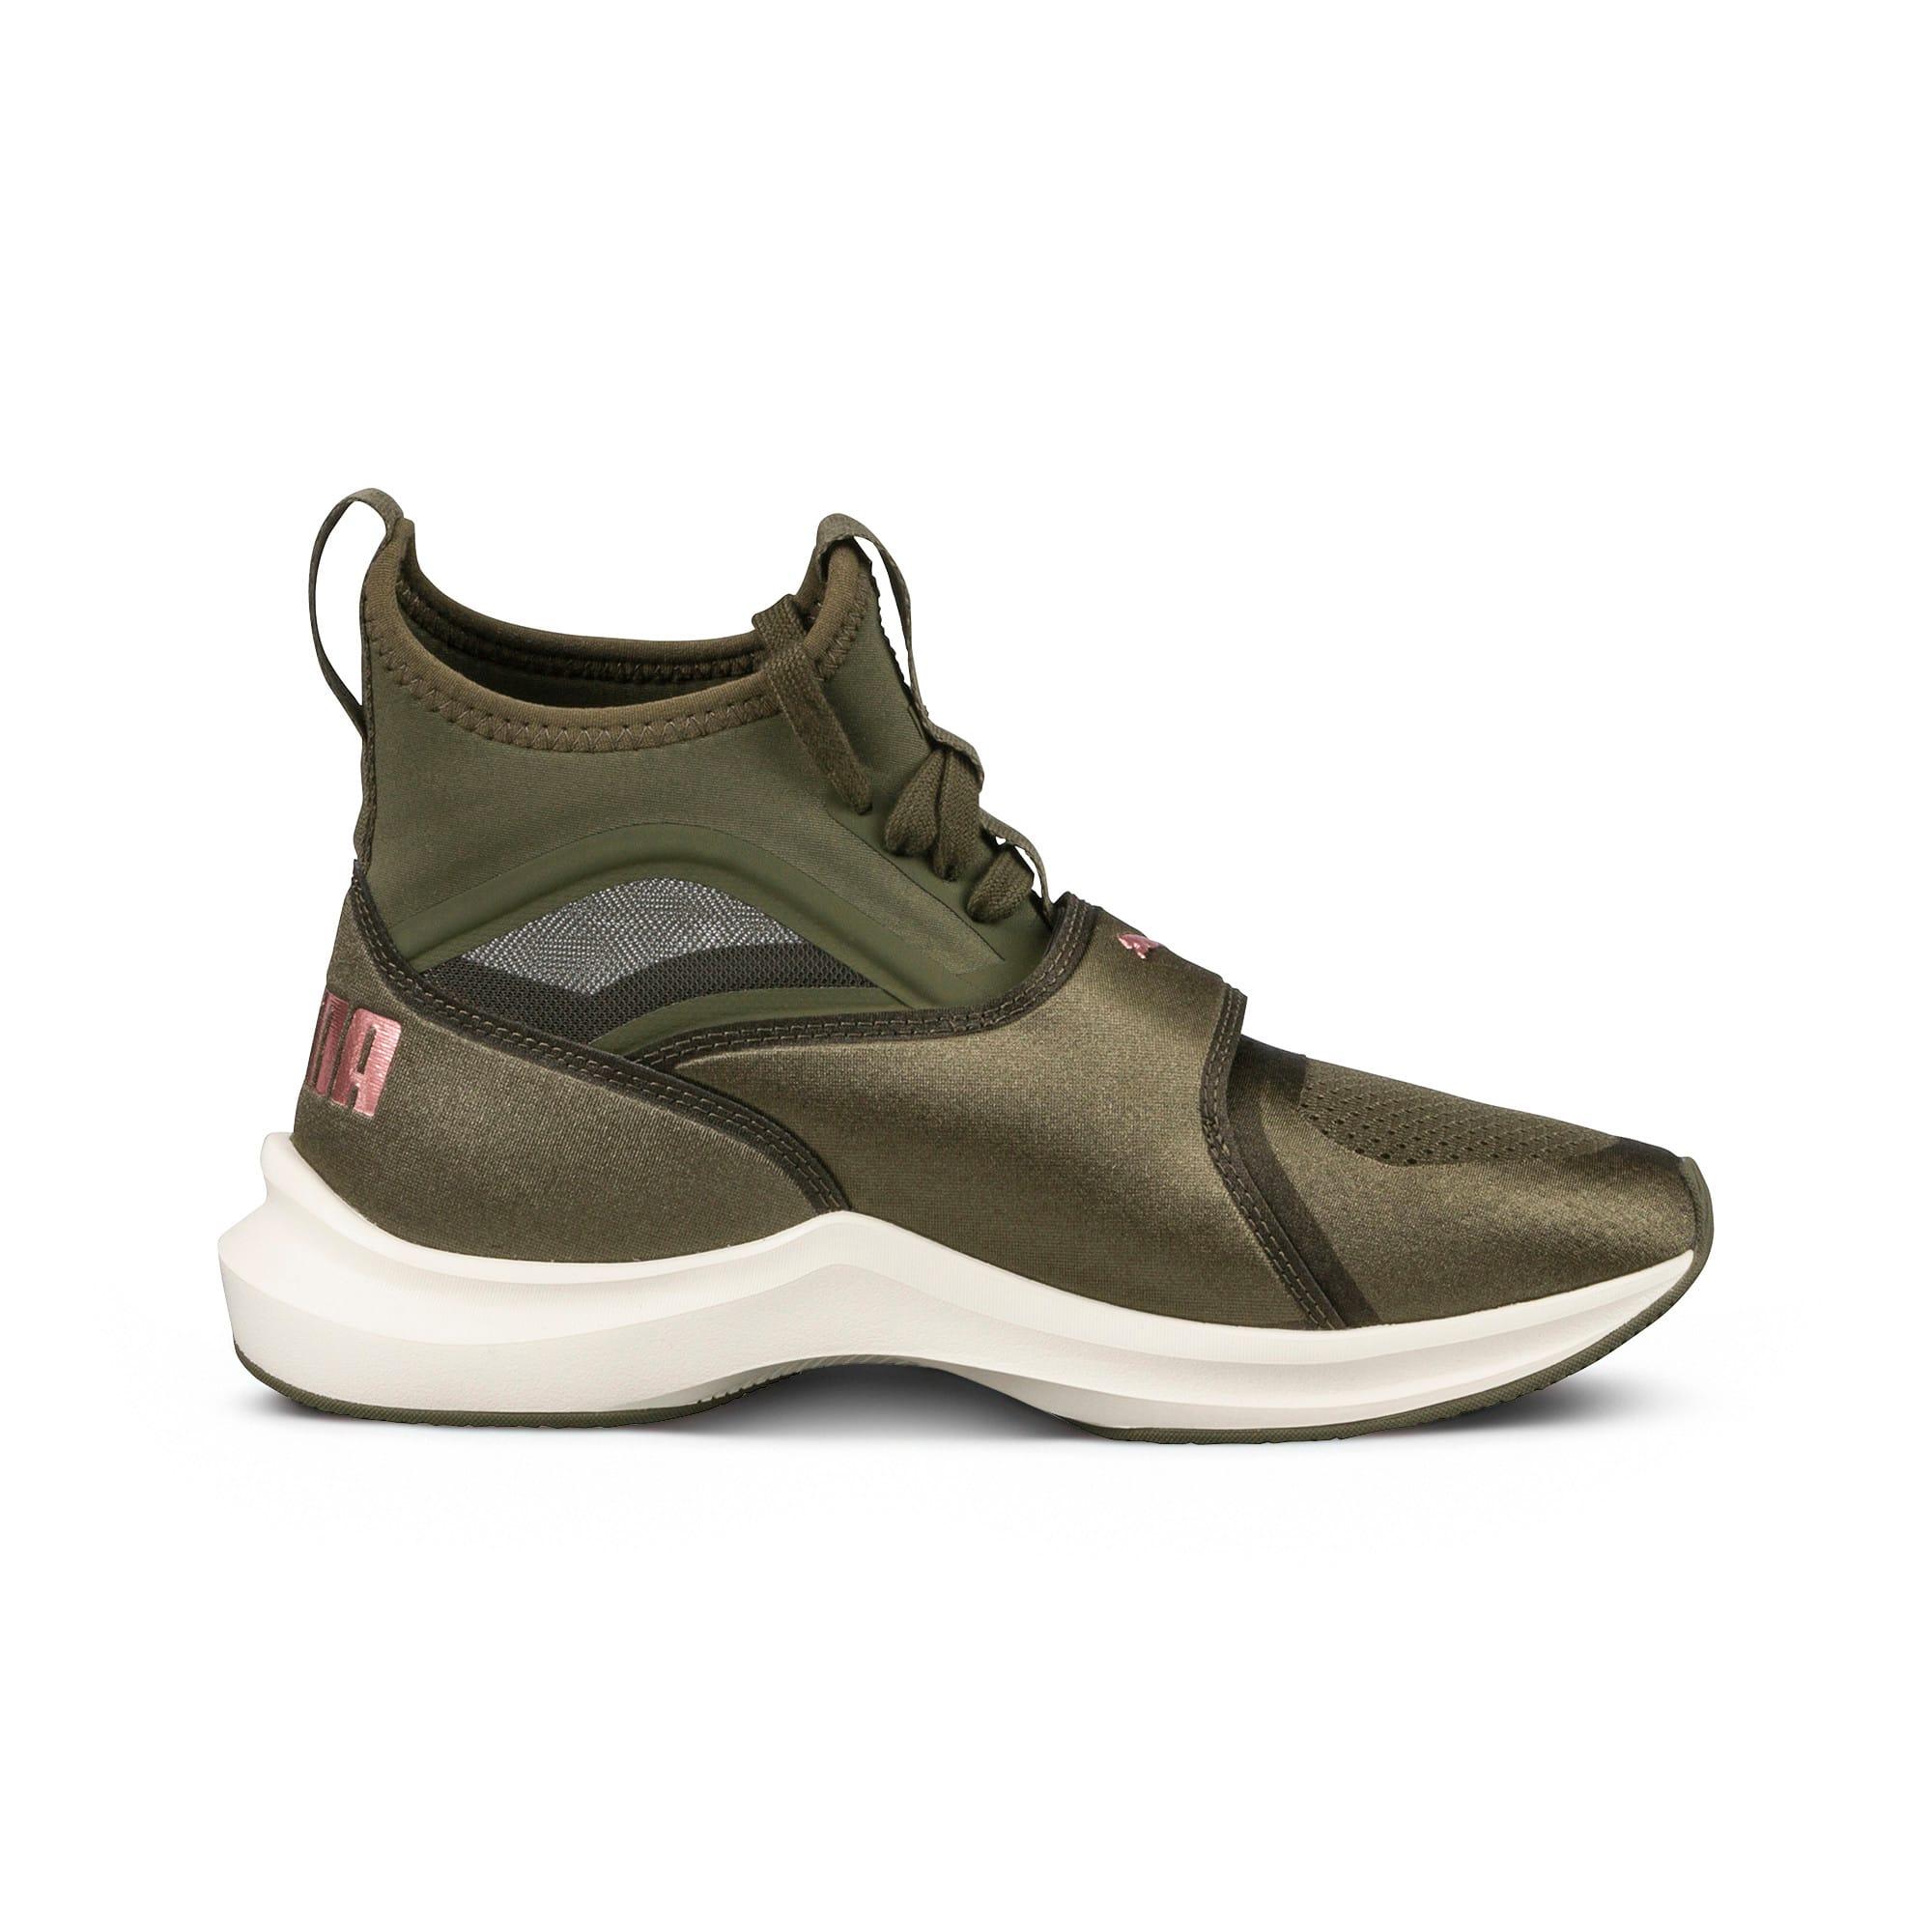 Thumbnail 3 of Phenom Women's Training Shoes, Olive Night-Whisper White, medium